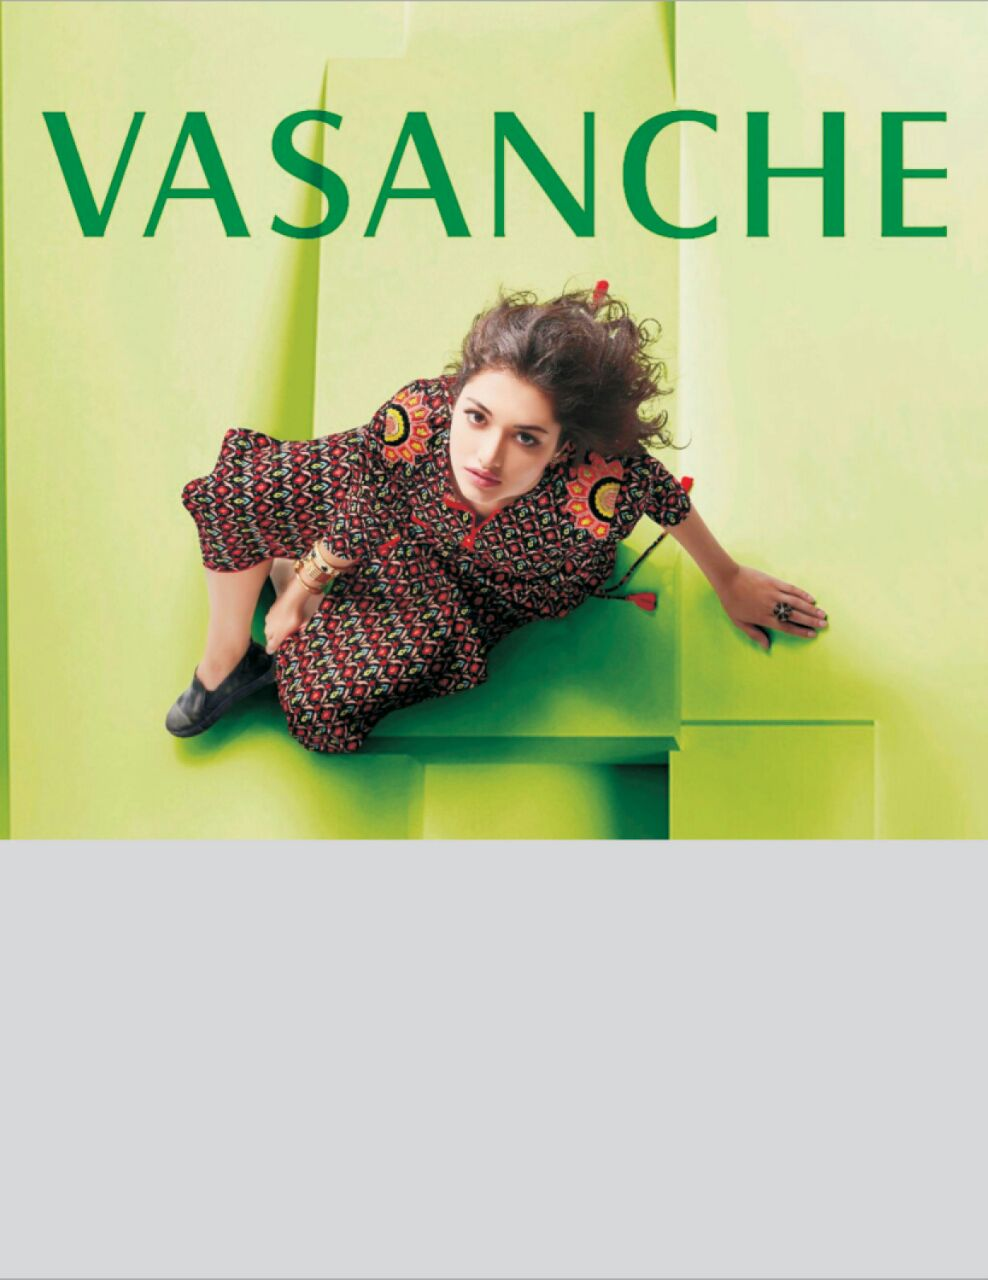 VASANCHE Presents UPER KURTI CATALOG